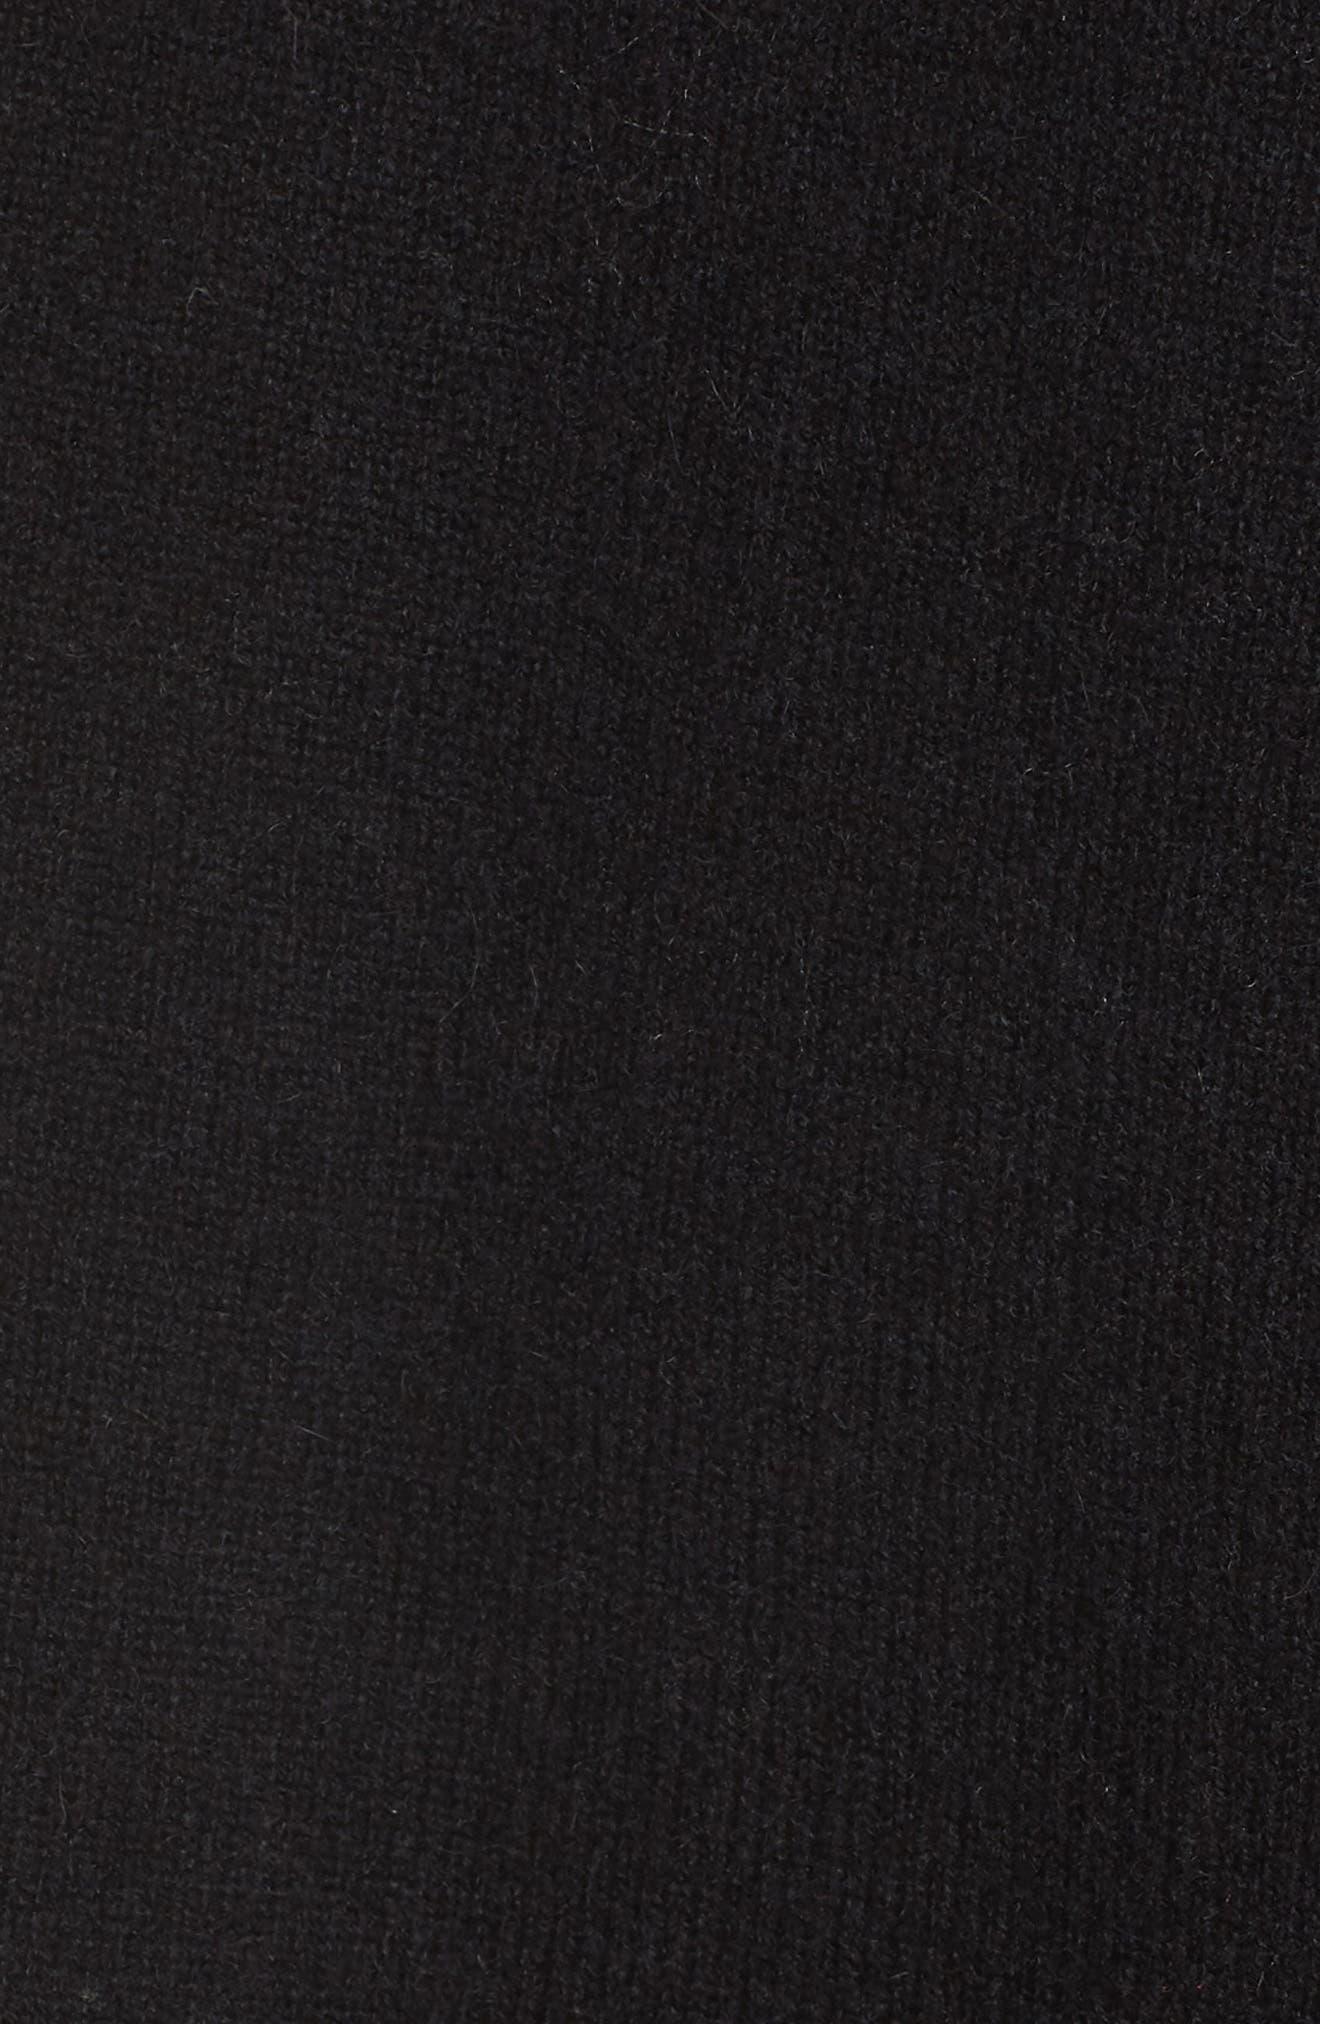 Shawl Collar Cashmere Cardigan,                             Alternate thumbnail 5, color,                             001